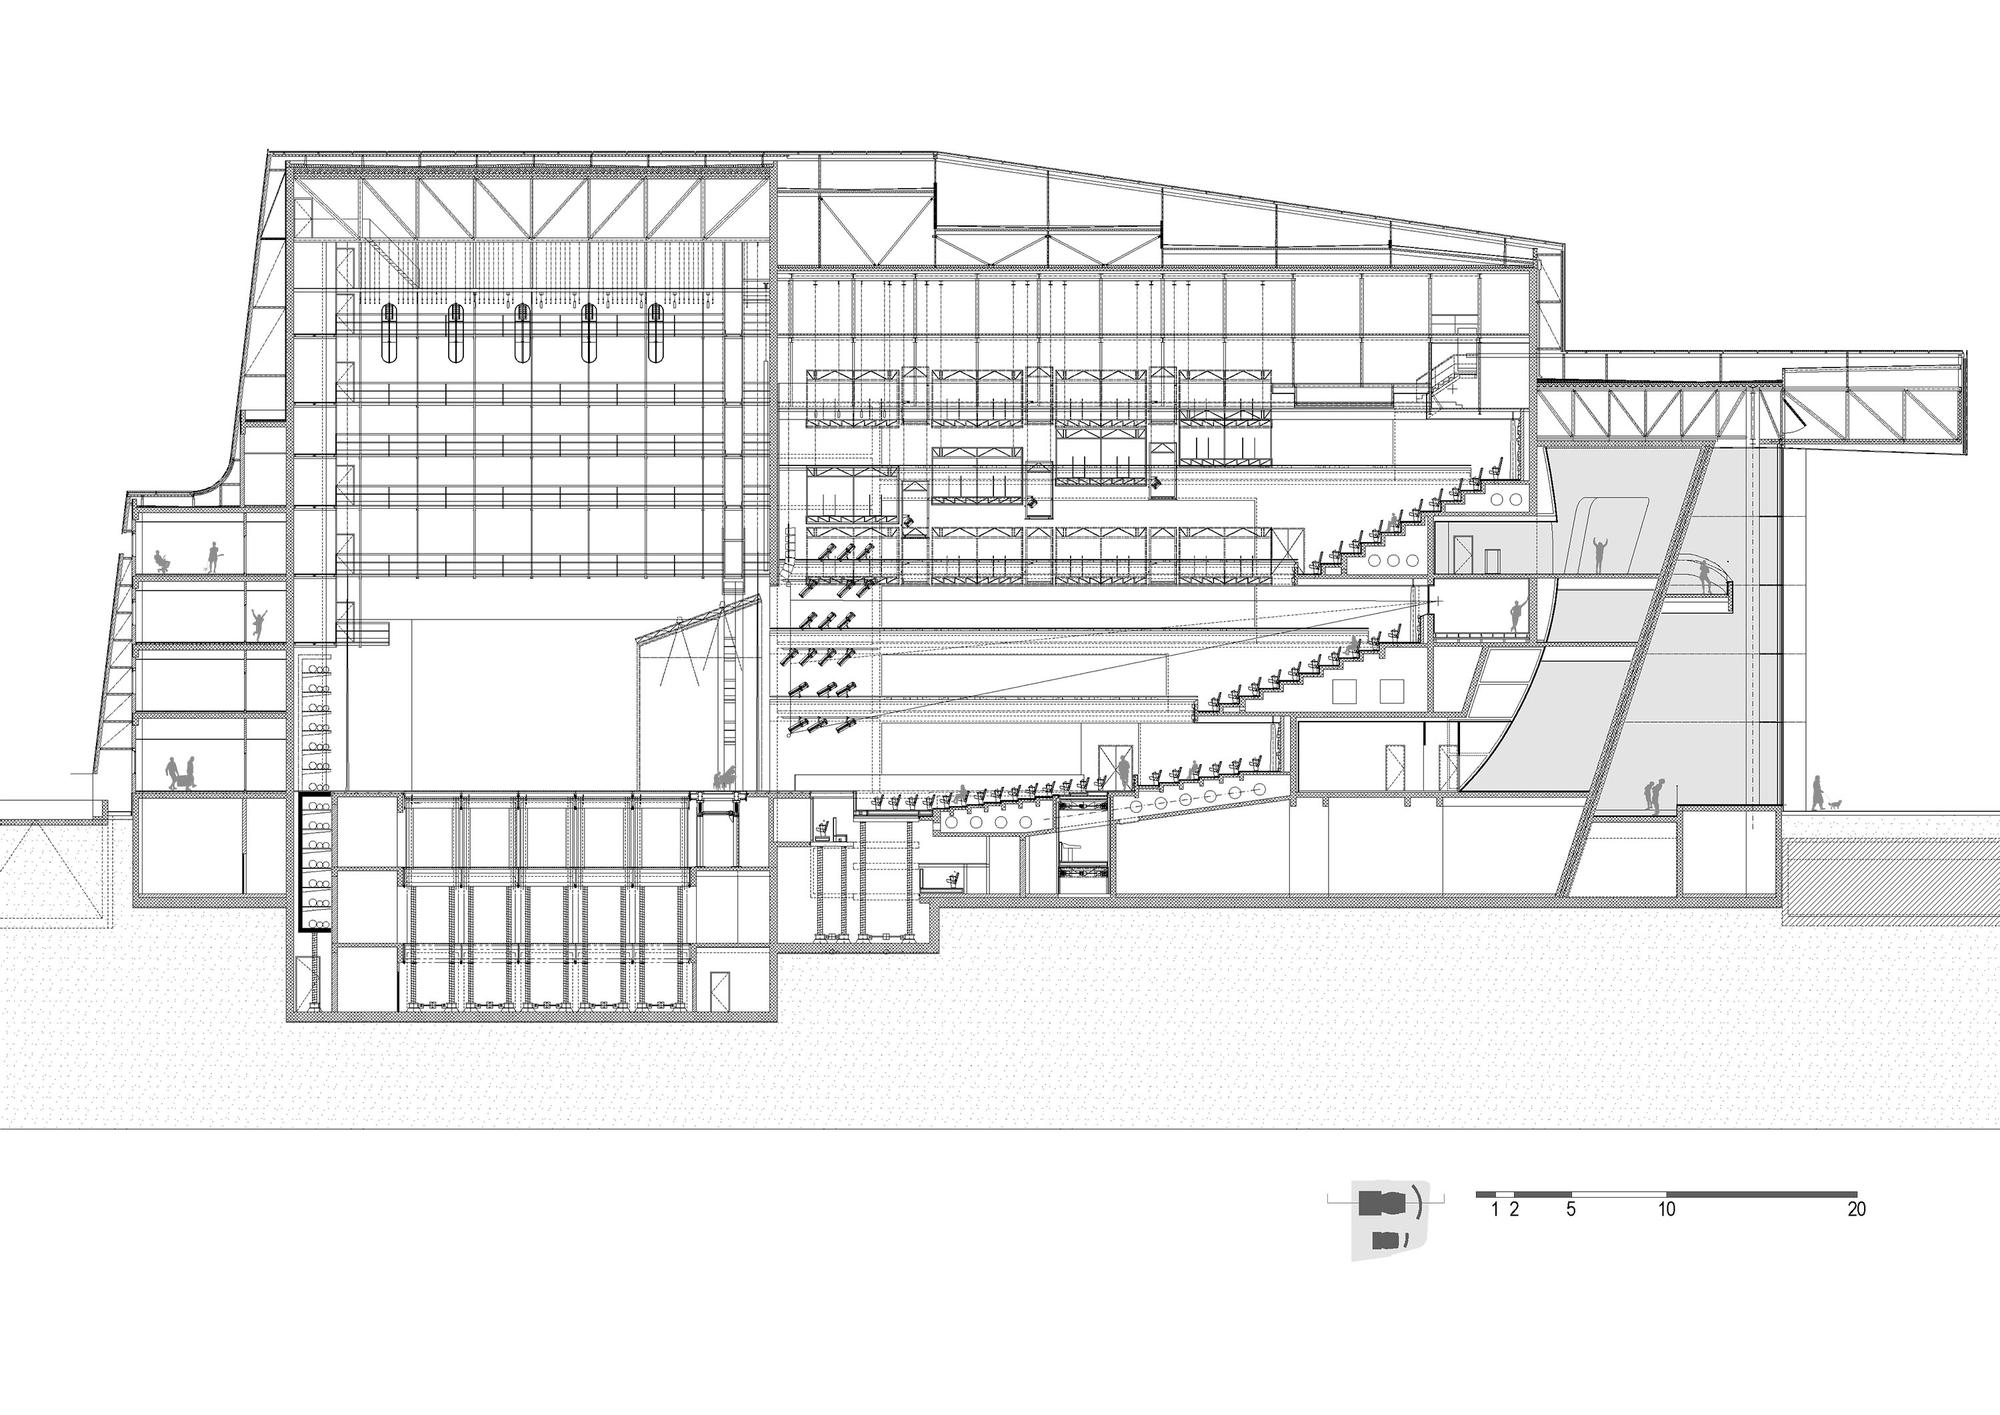 http://ad009cdnb.archdaily.net/wp-content/uploads/2014/11/545d8c70e58ece70e00000ff_shenzhen-performing-arts-facility-zoboki-demeter-associates-_nanshan_section.png